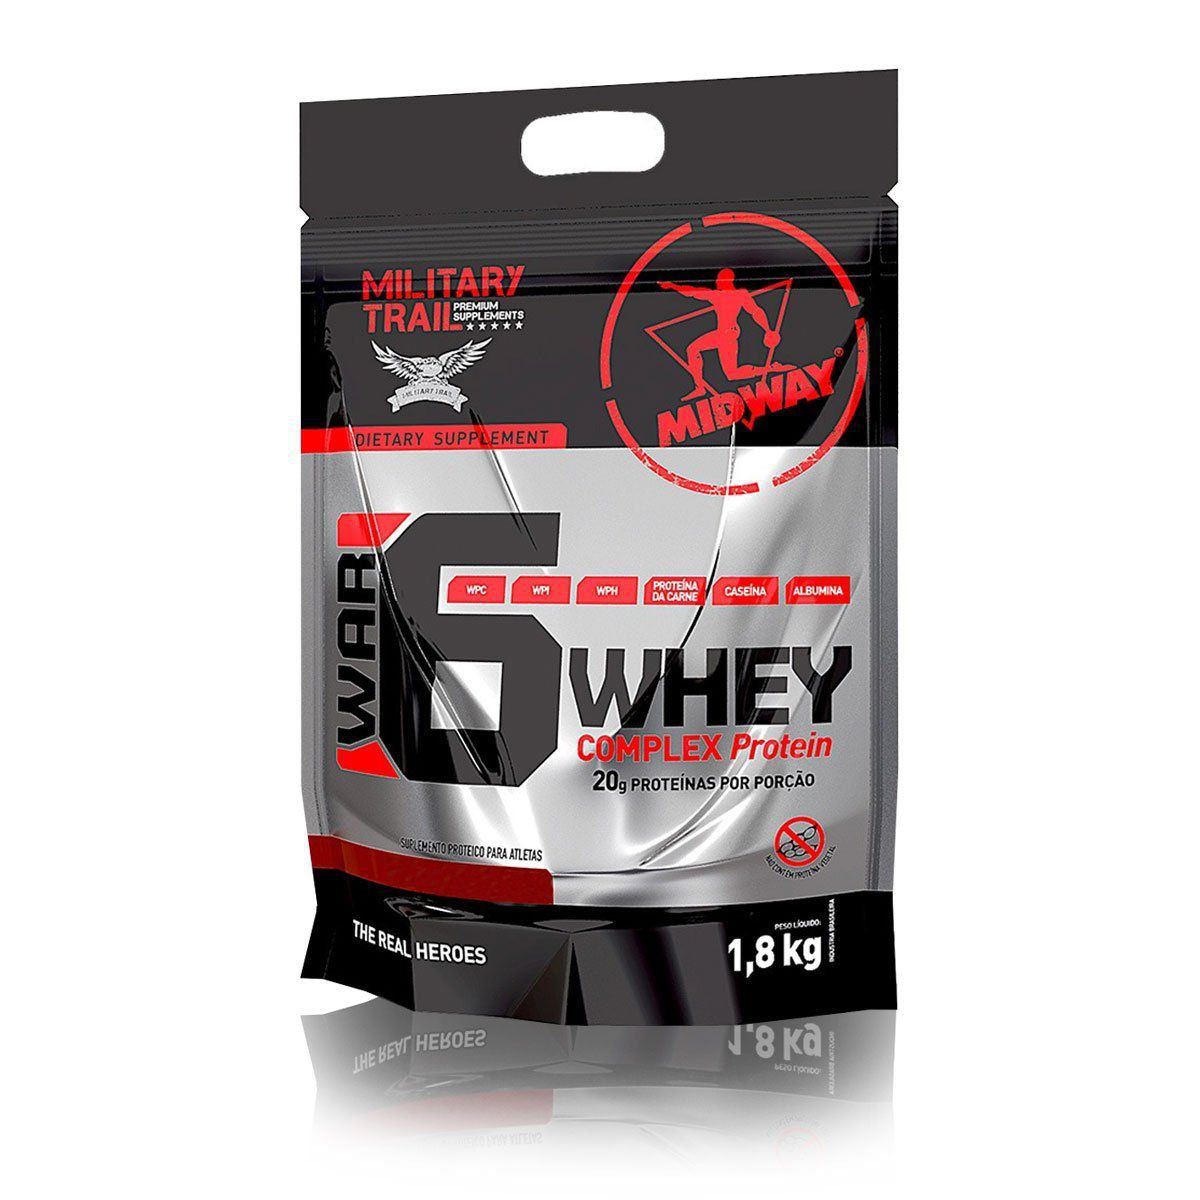 War 6 Whey Protein Complex 1,8 kg - Midway Labs